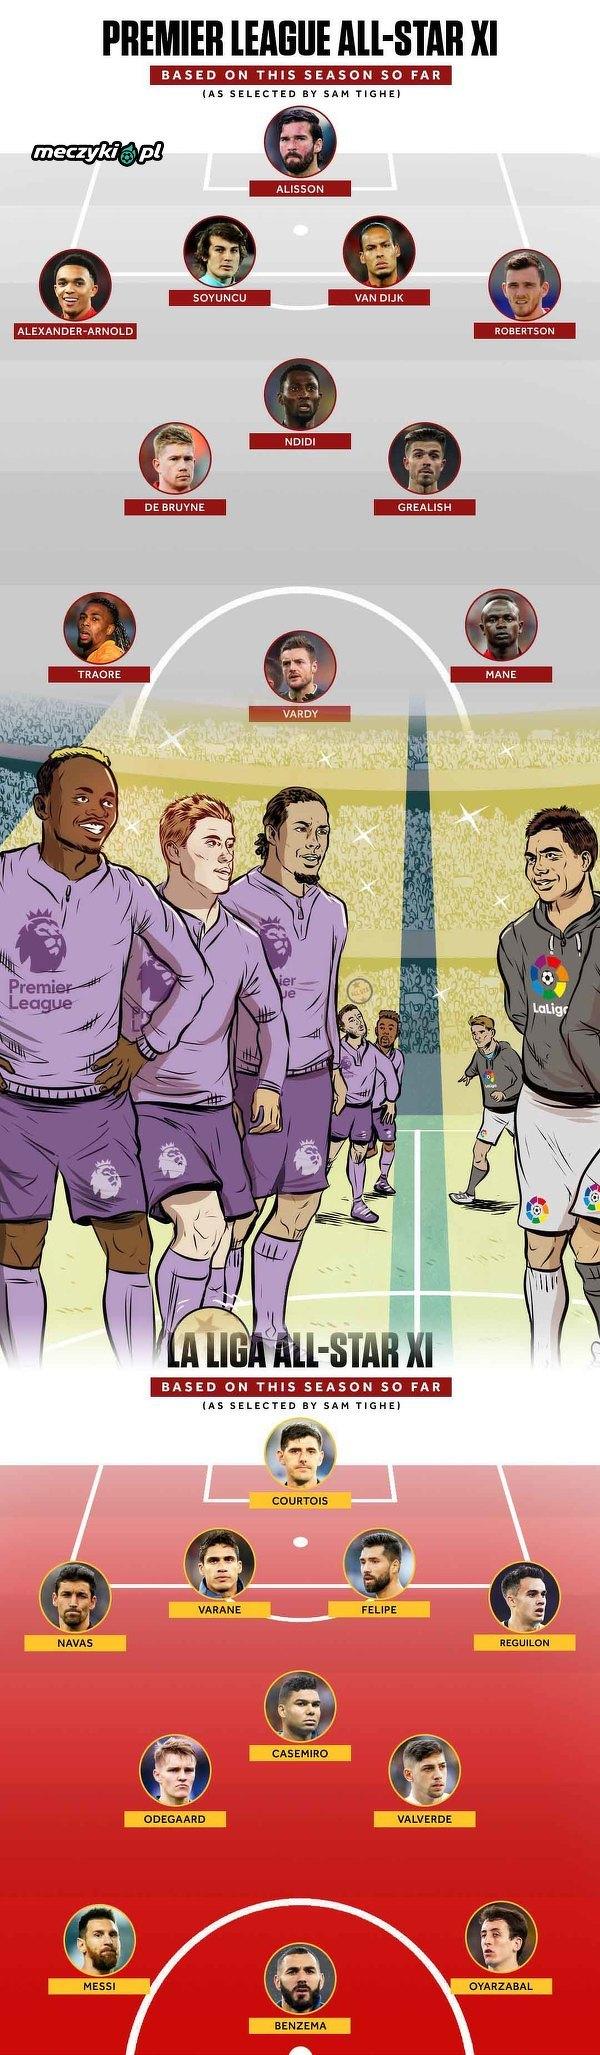 Najlepsza 11 La Liga vs najlepsza 11 Premier League